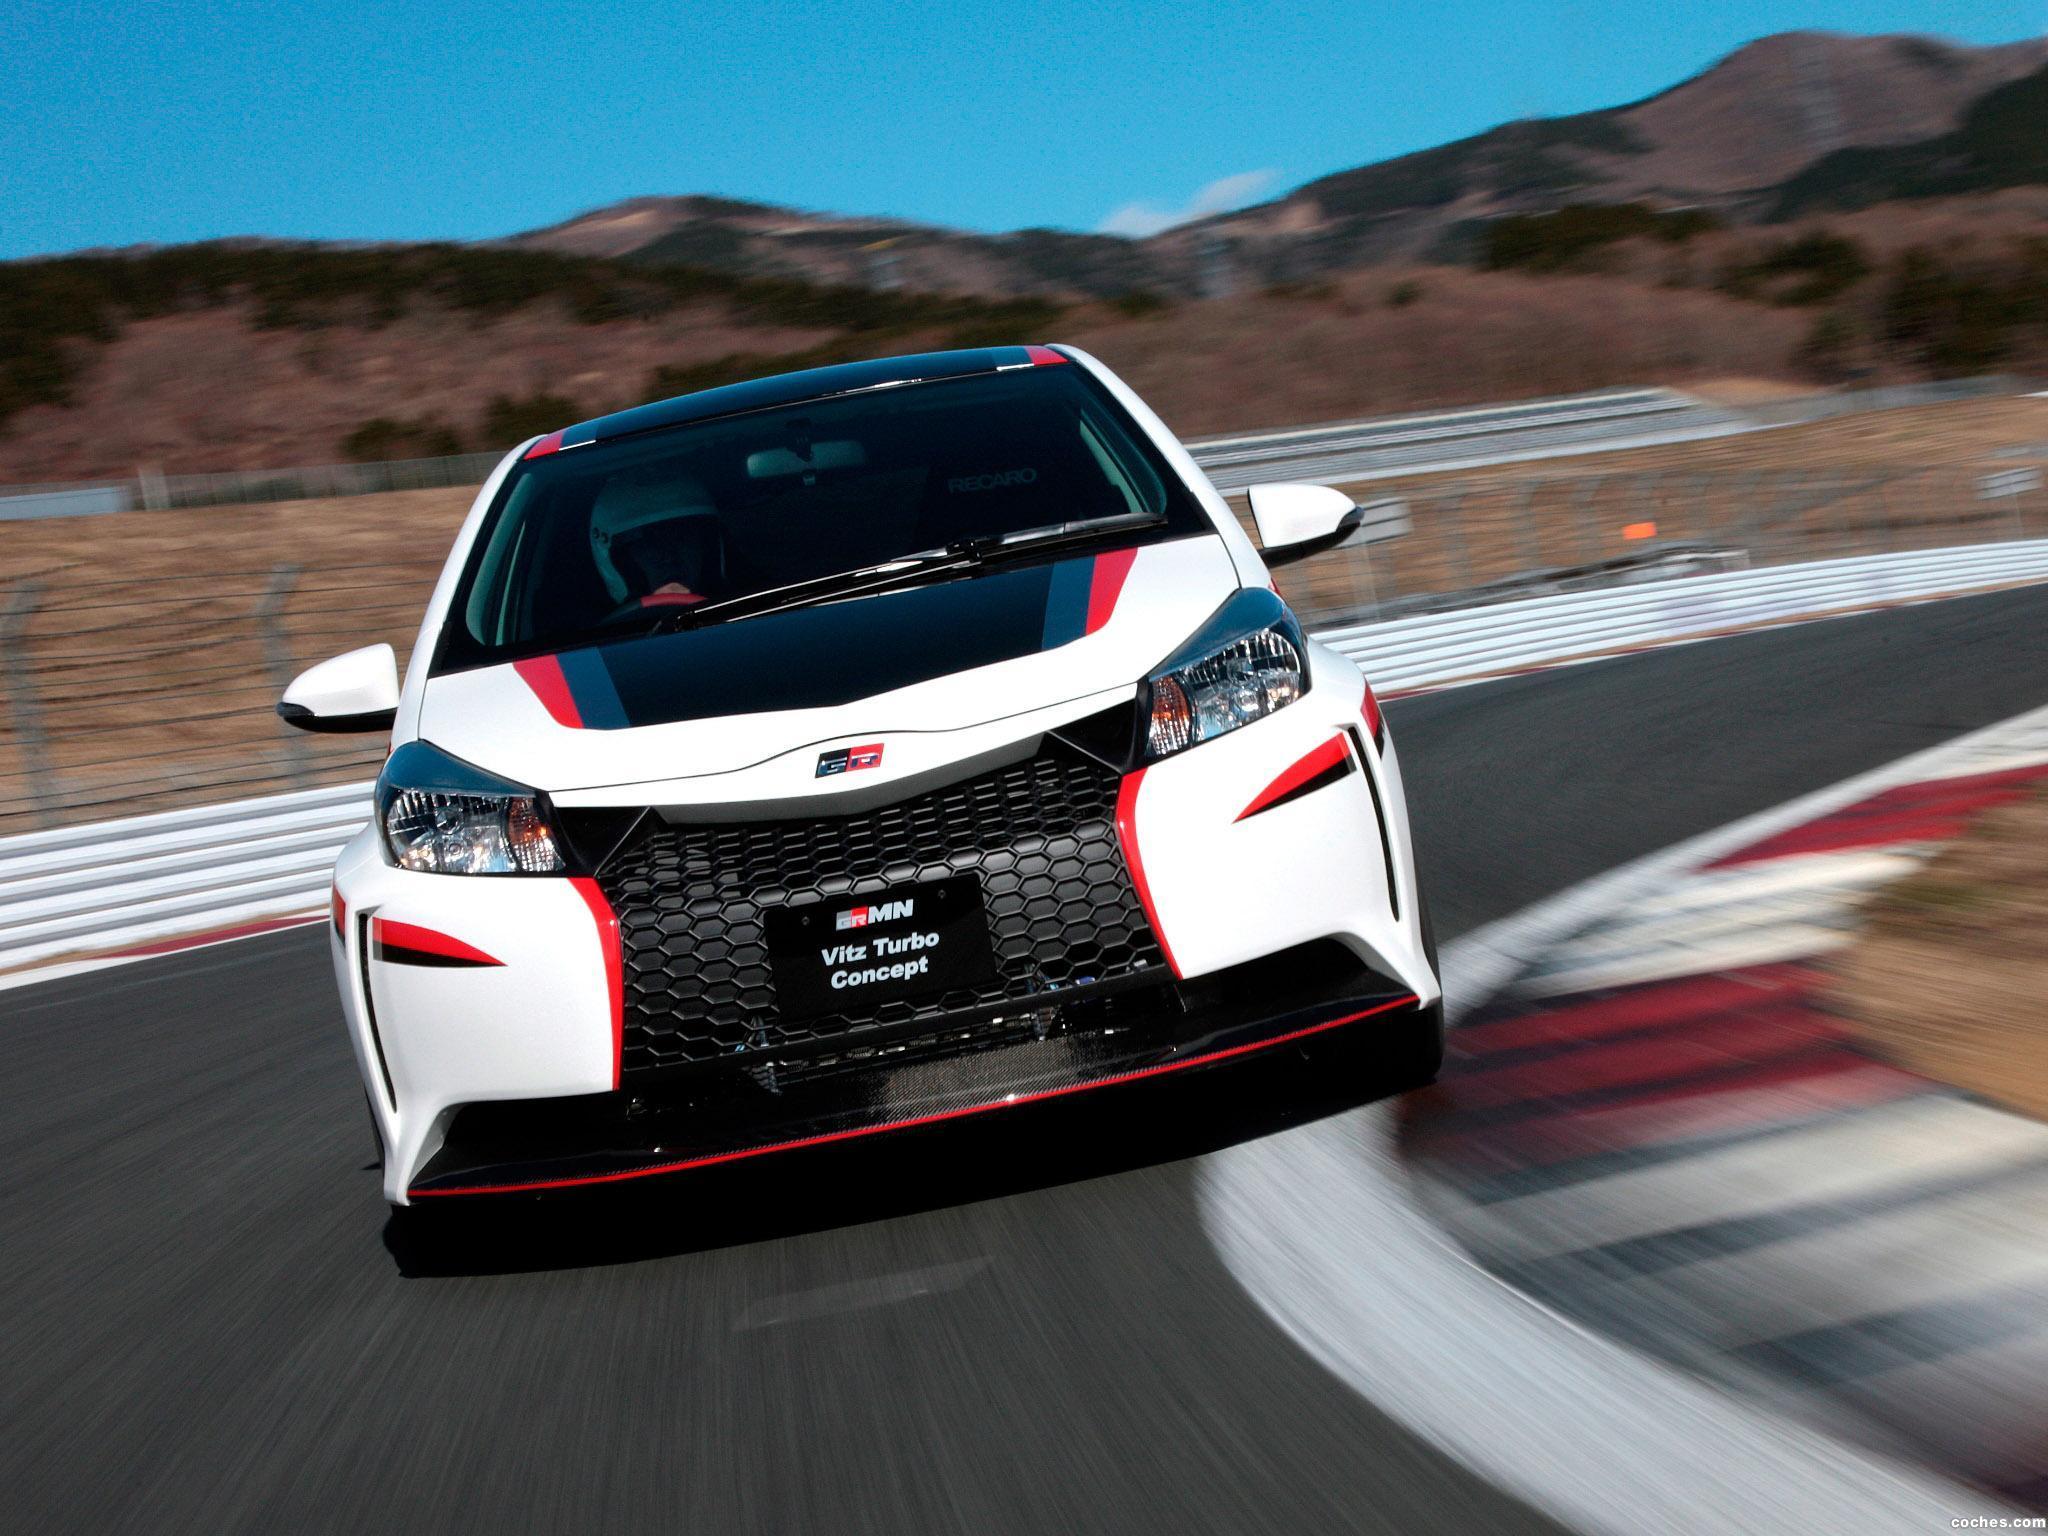 Foto 0 de GRMN Toyota Vitz Turbo Concept 2011